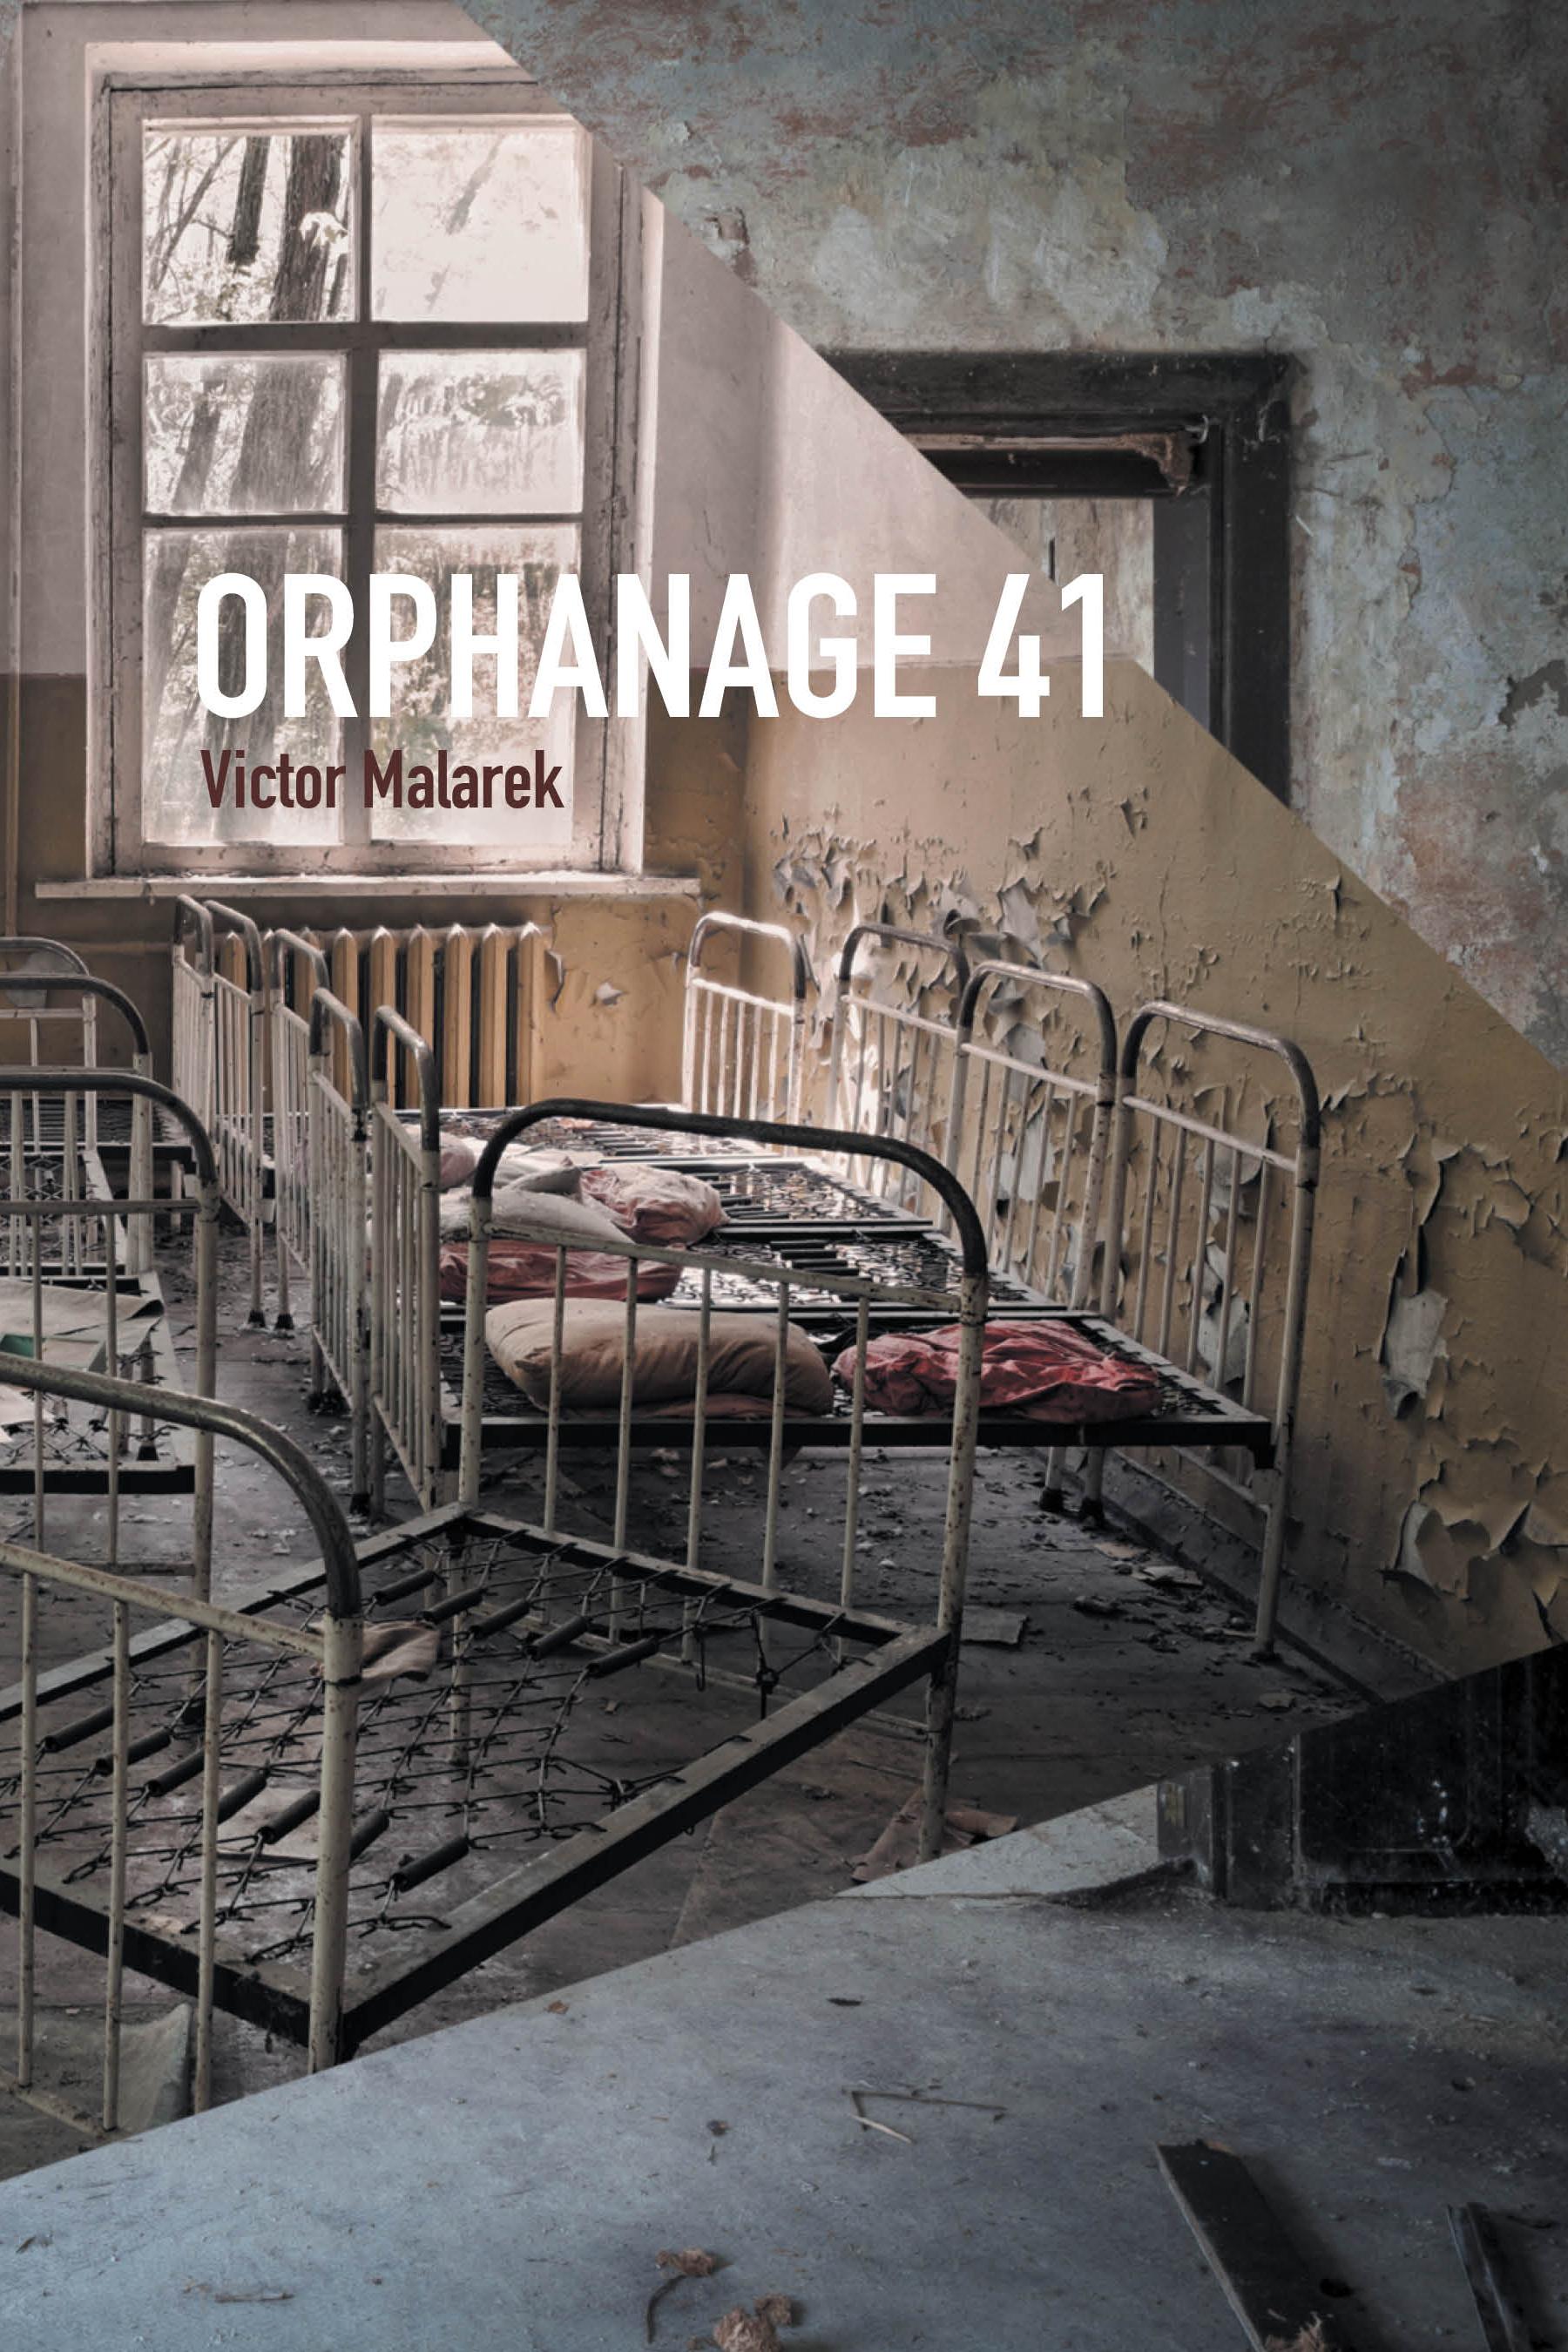 Victor Malarek, author of Orphanage 41